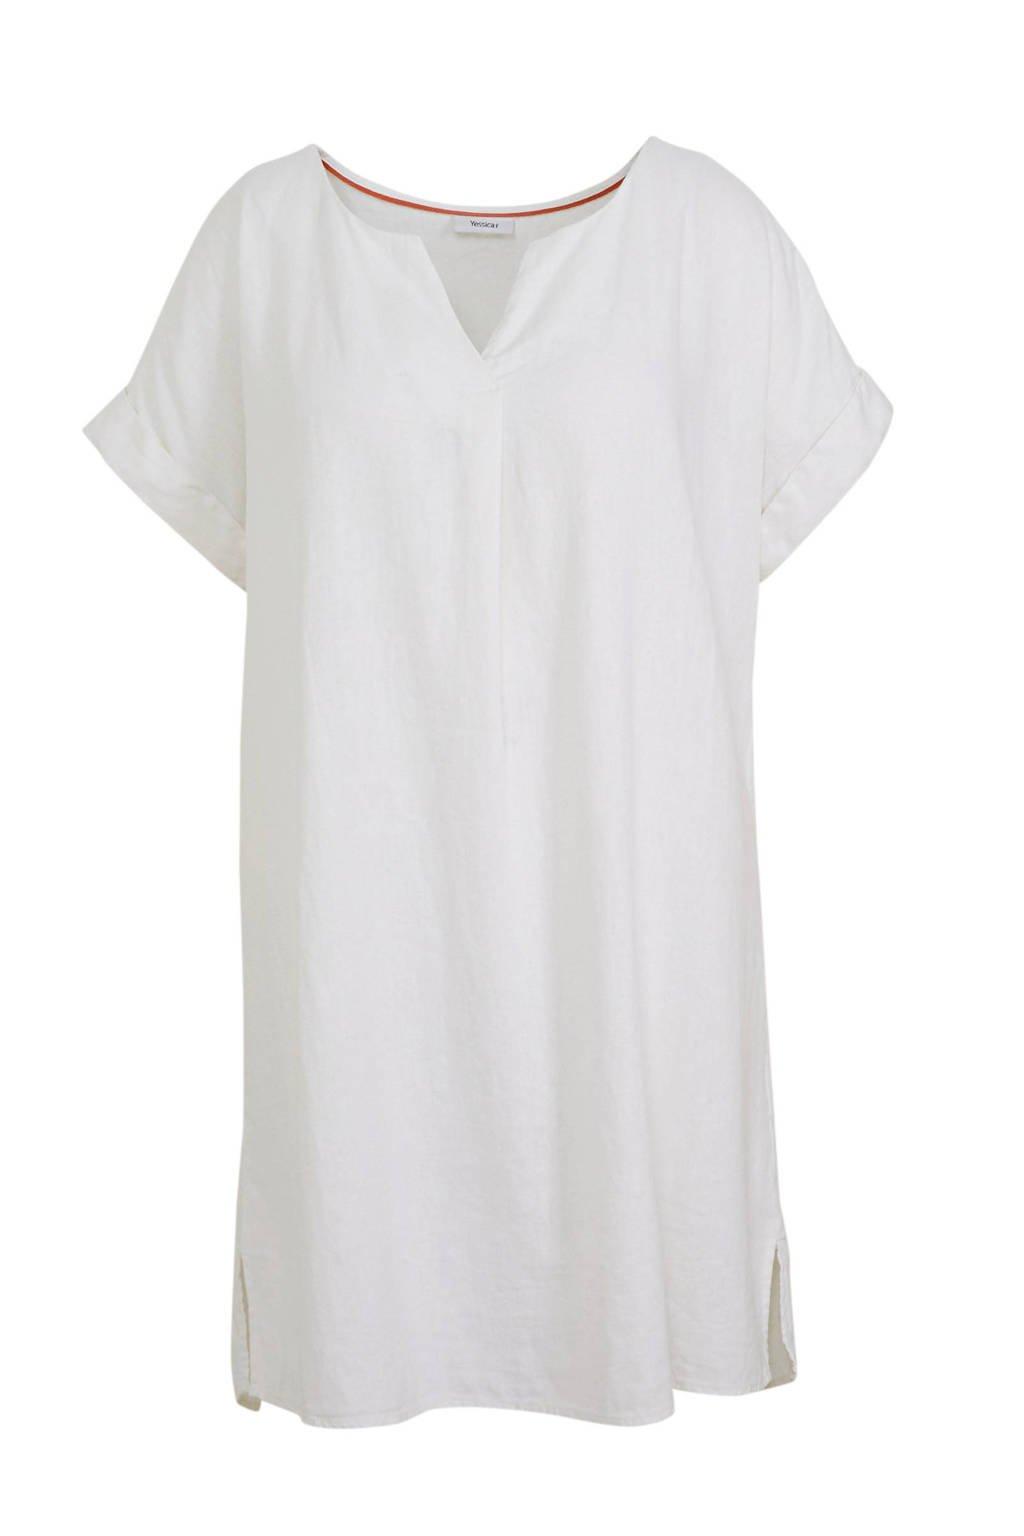 C&A XL Yessica jurk met linnen wit, Wit